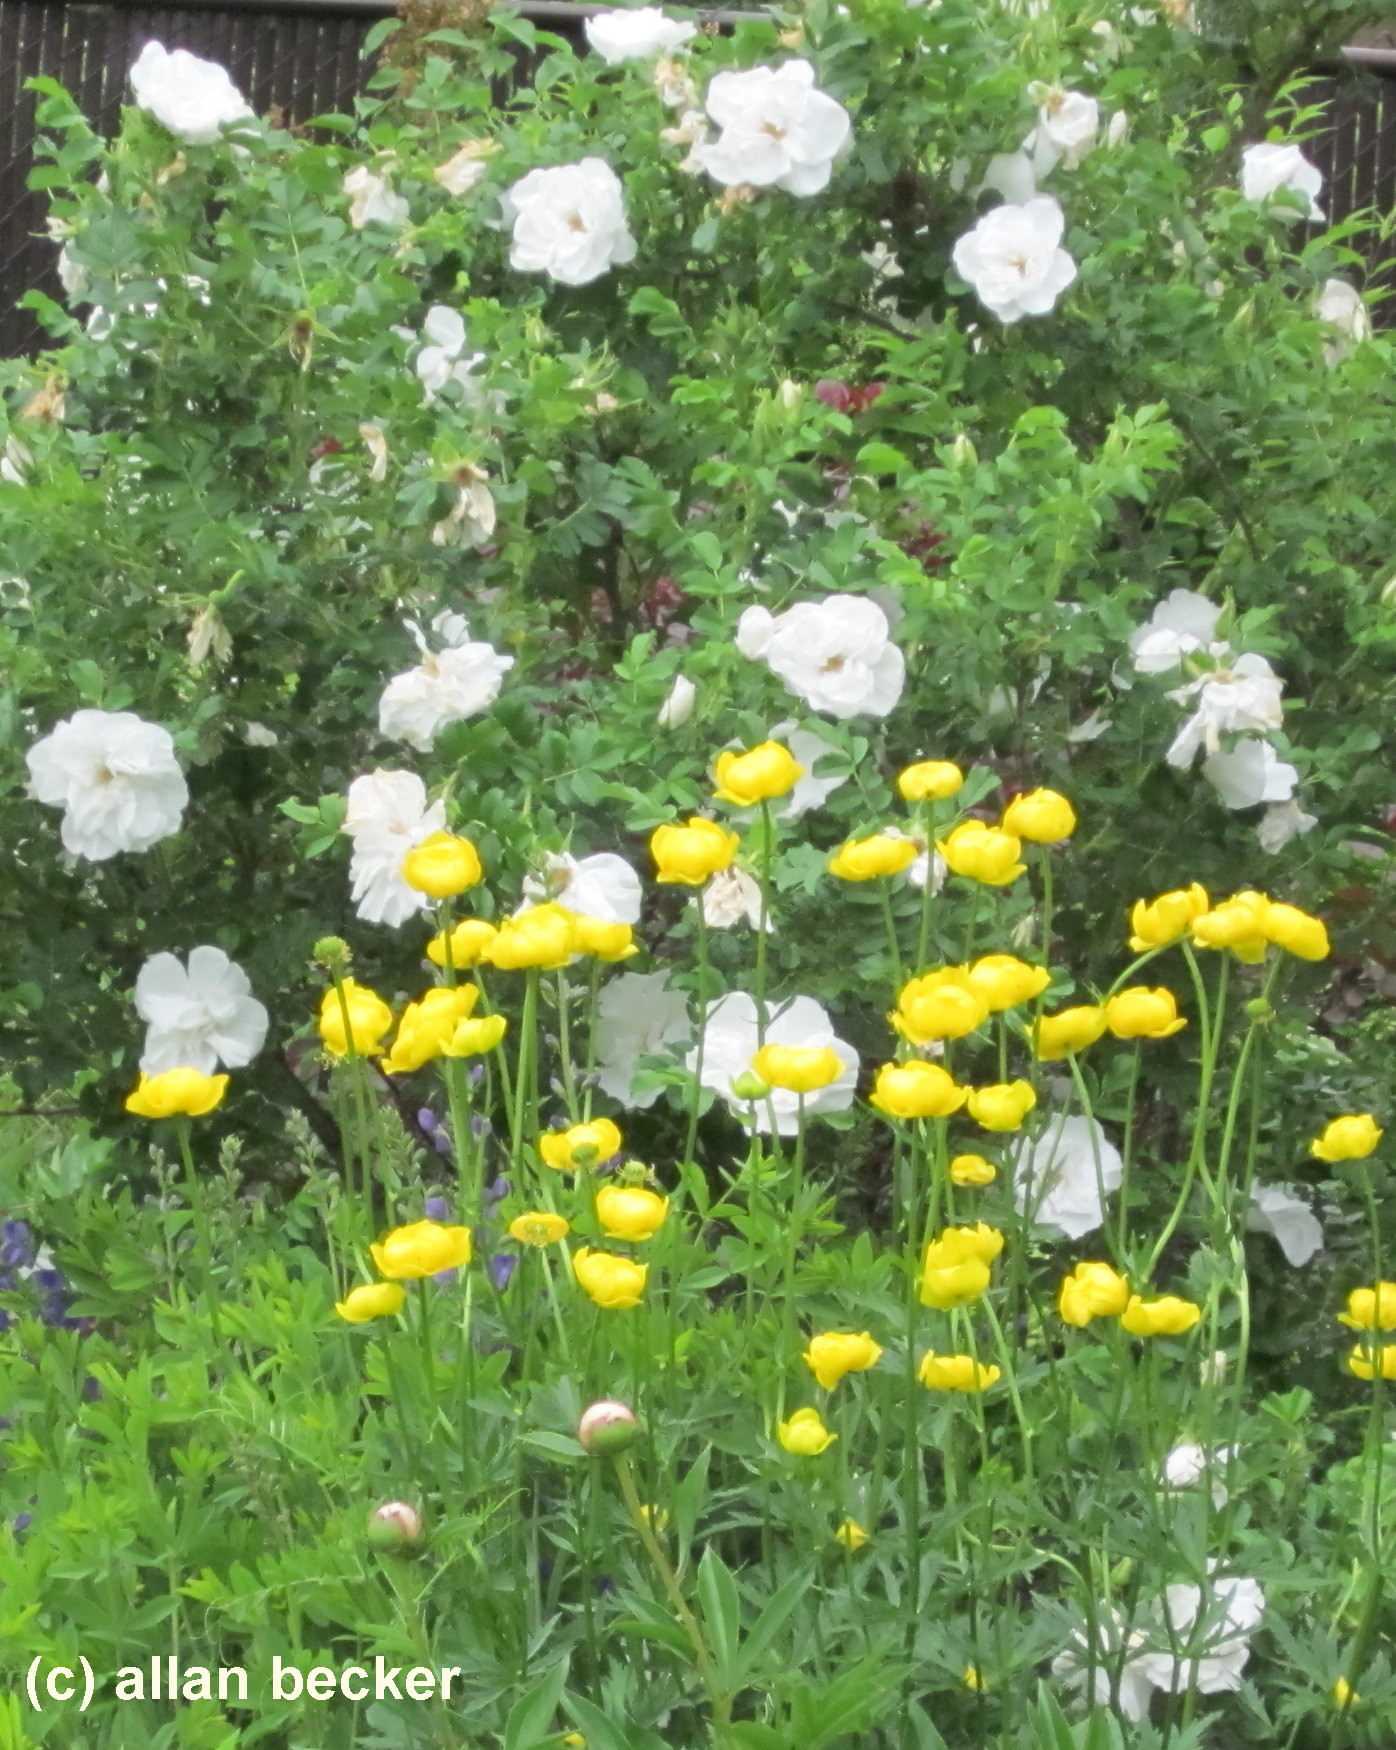 Early summer flowering